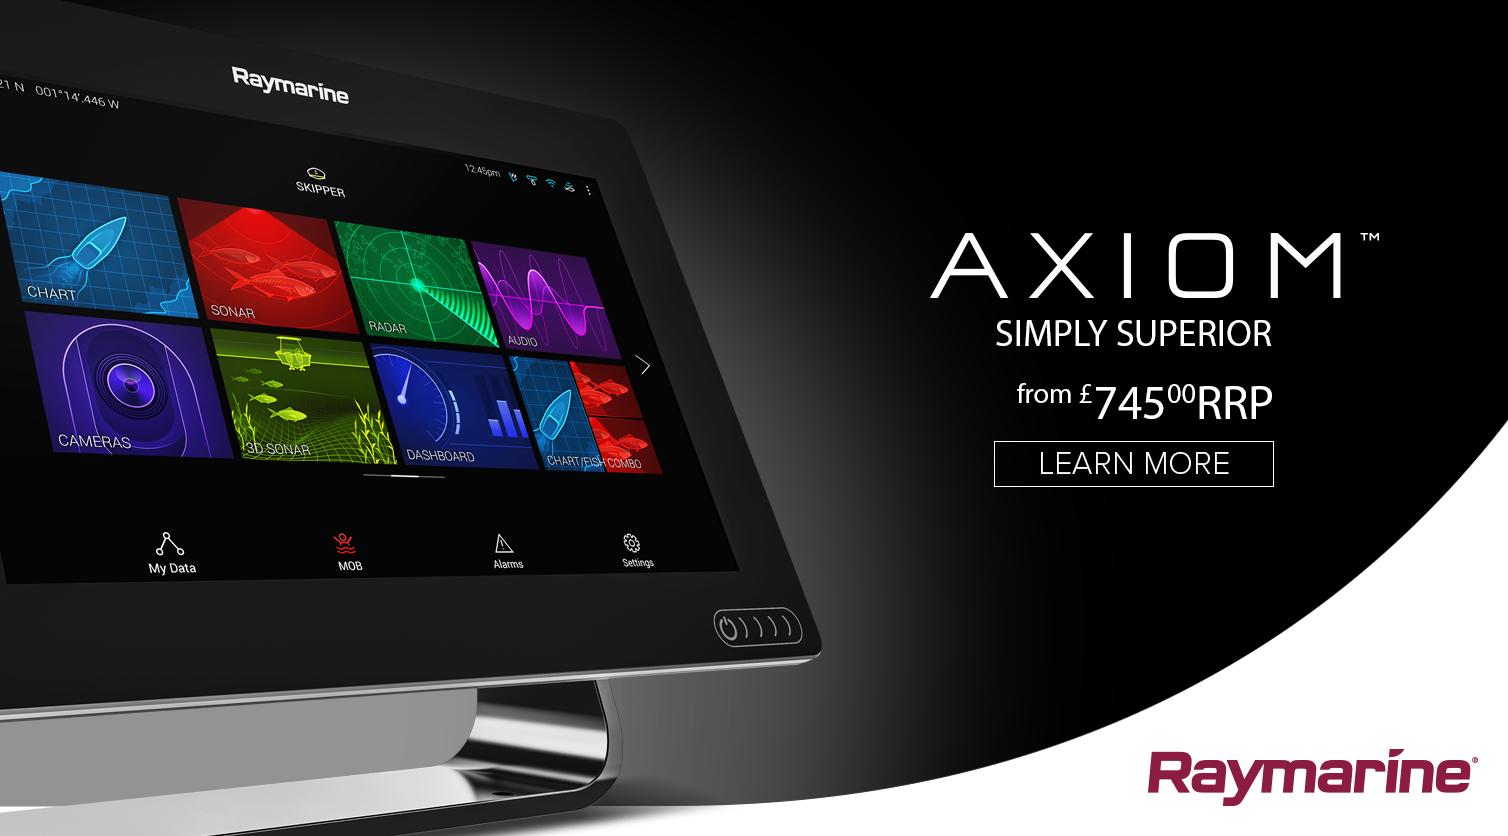 Inroducing the new Raymarine Axiom superior technology MFD